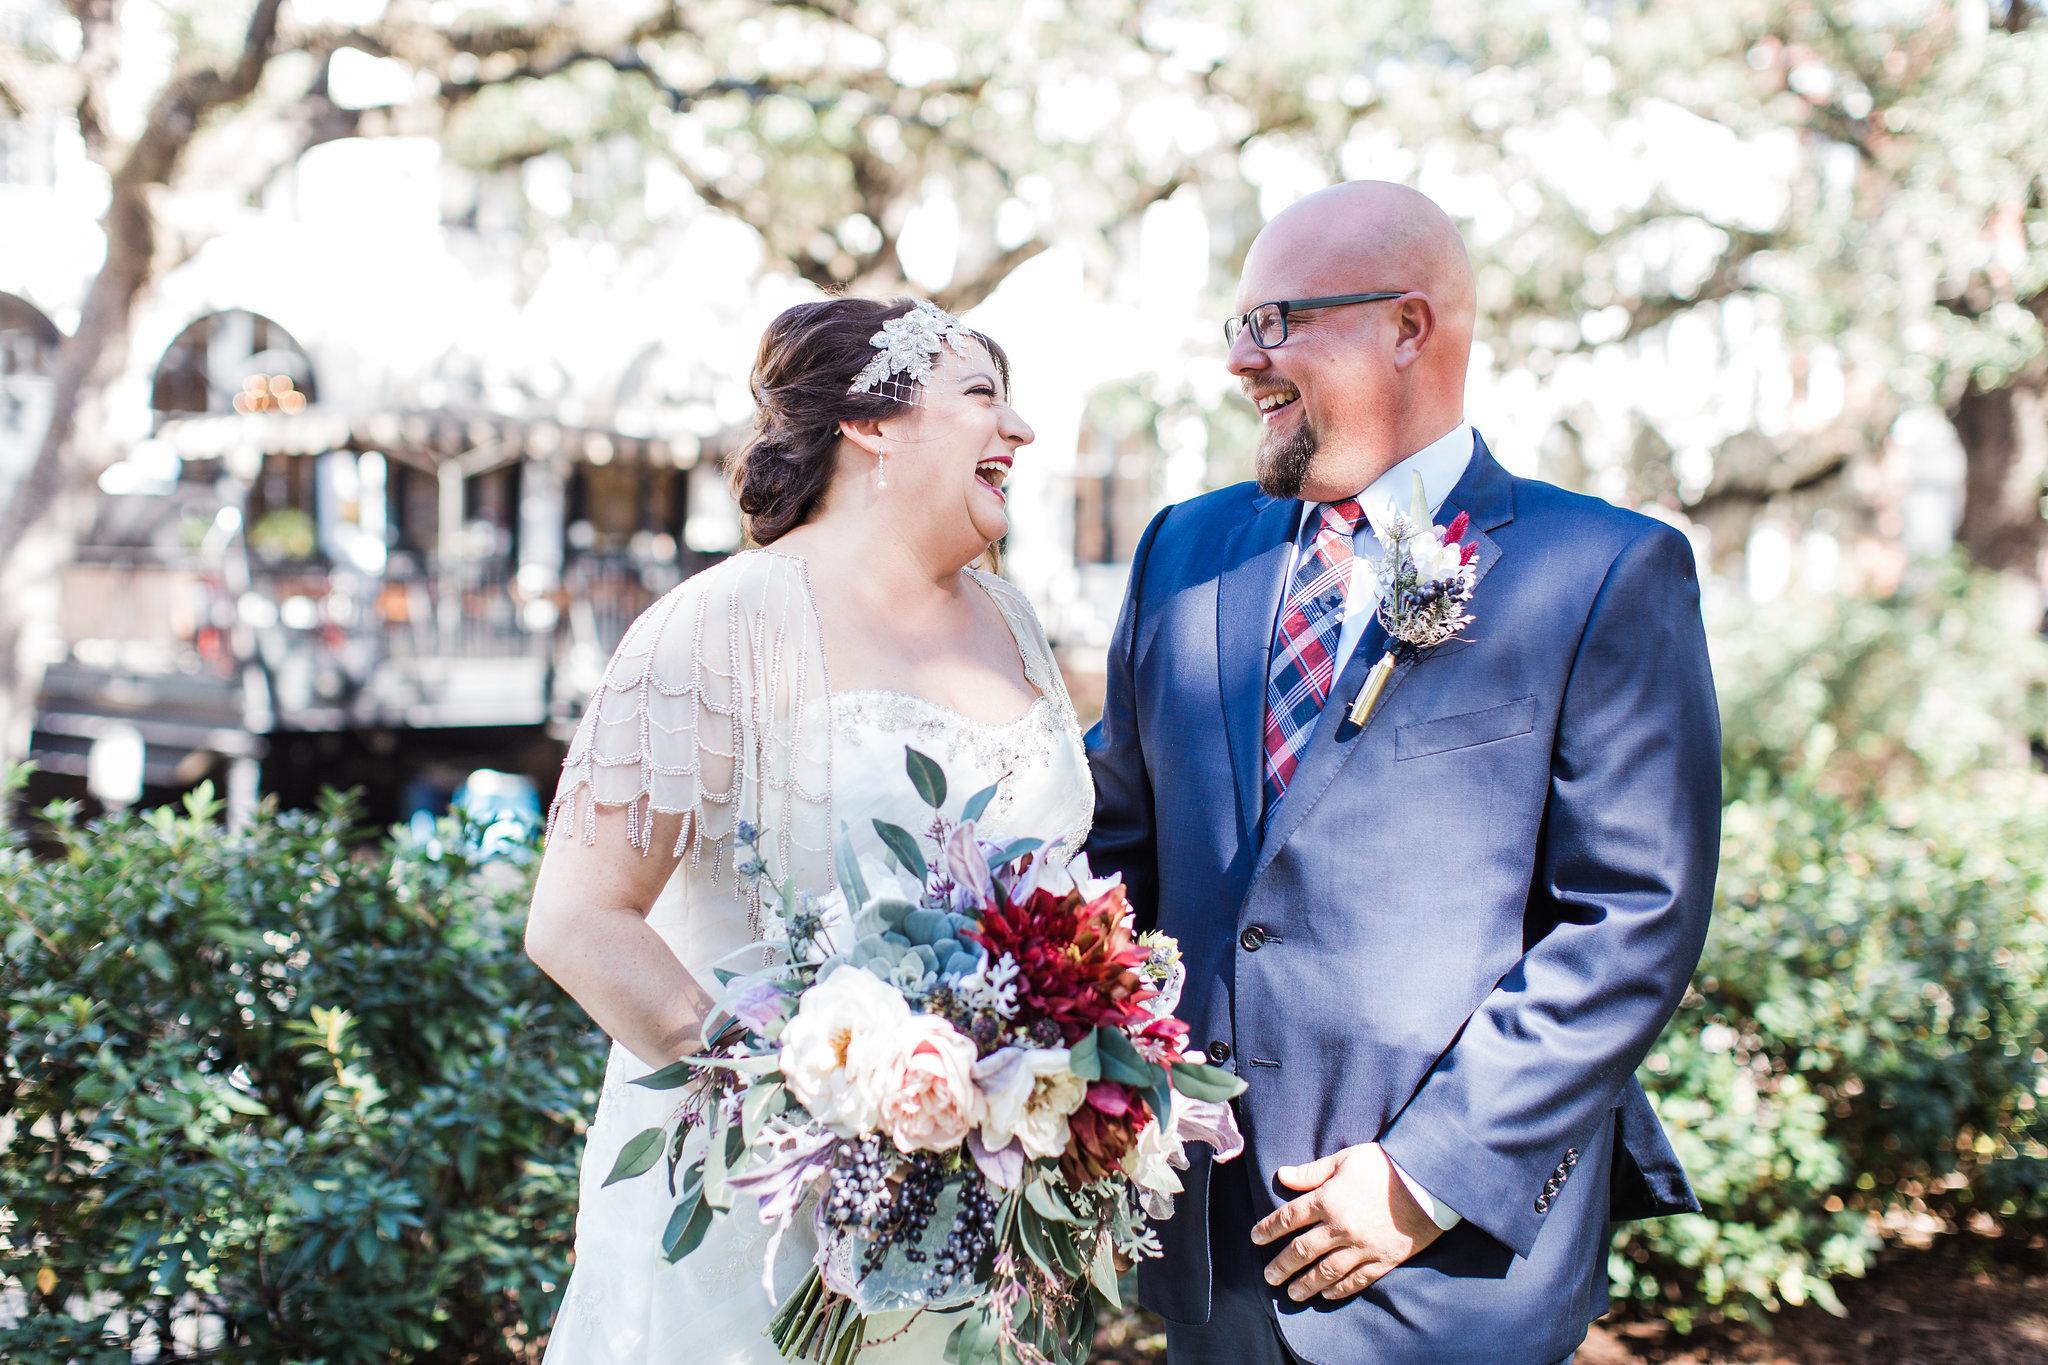 apt-b-photography-kristy-rob-wormsloe-elopment-savannah-wedding-photographer-savannah-elopement-wormsloe-wedding-historic-savannah-first-look-8.jpg